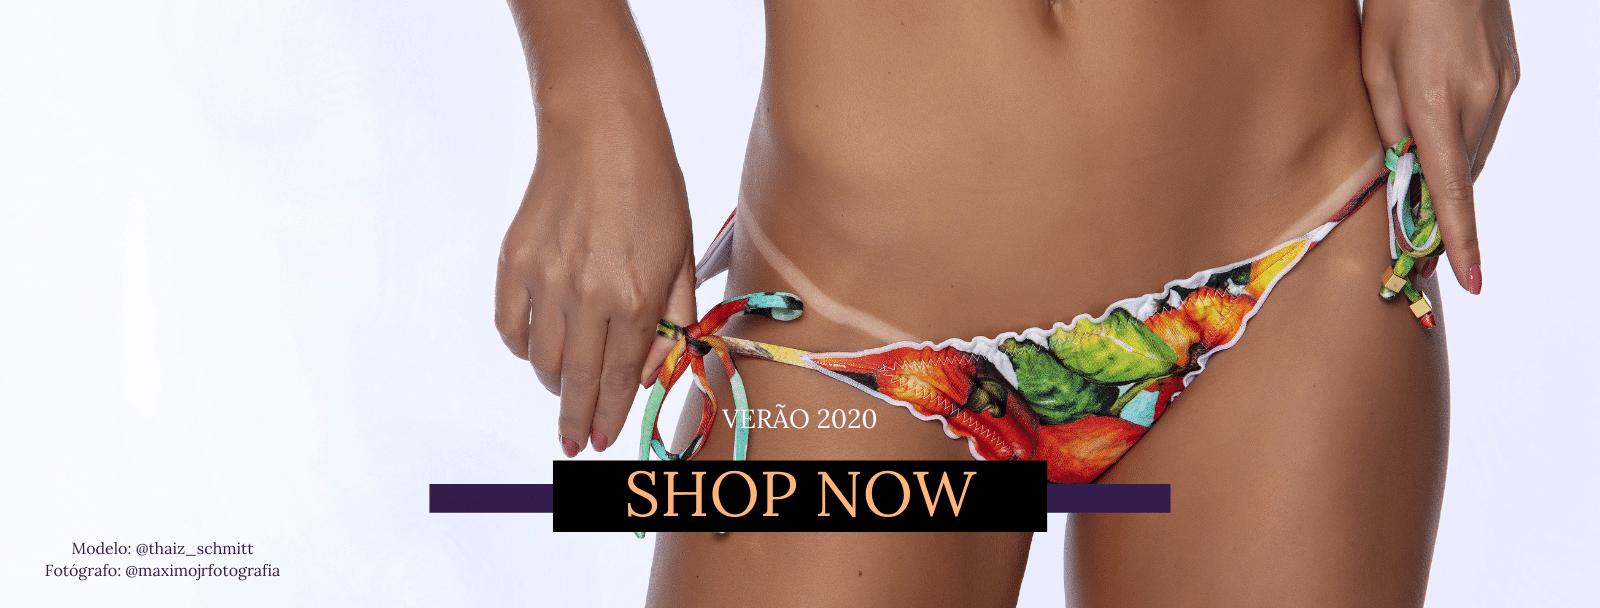 loja-online-moda-praia-livelle-beachwear-2